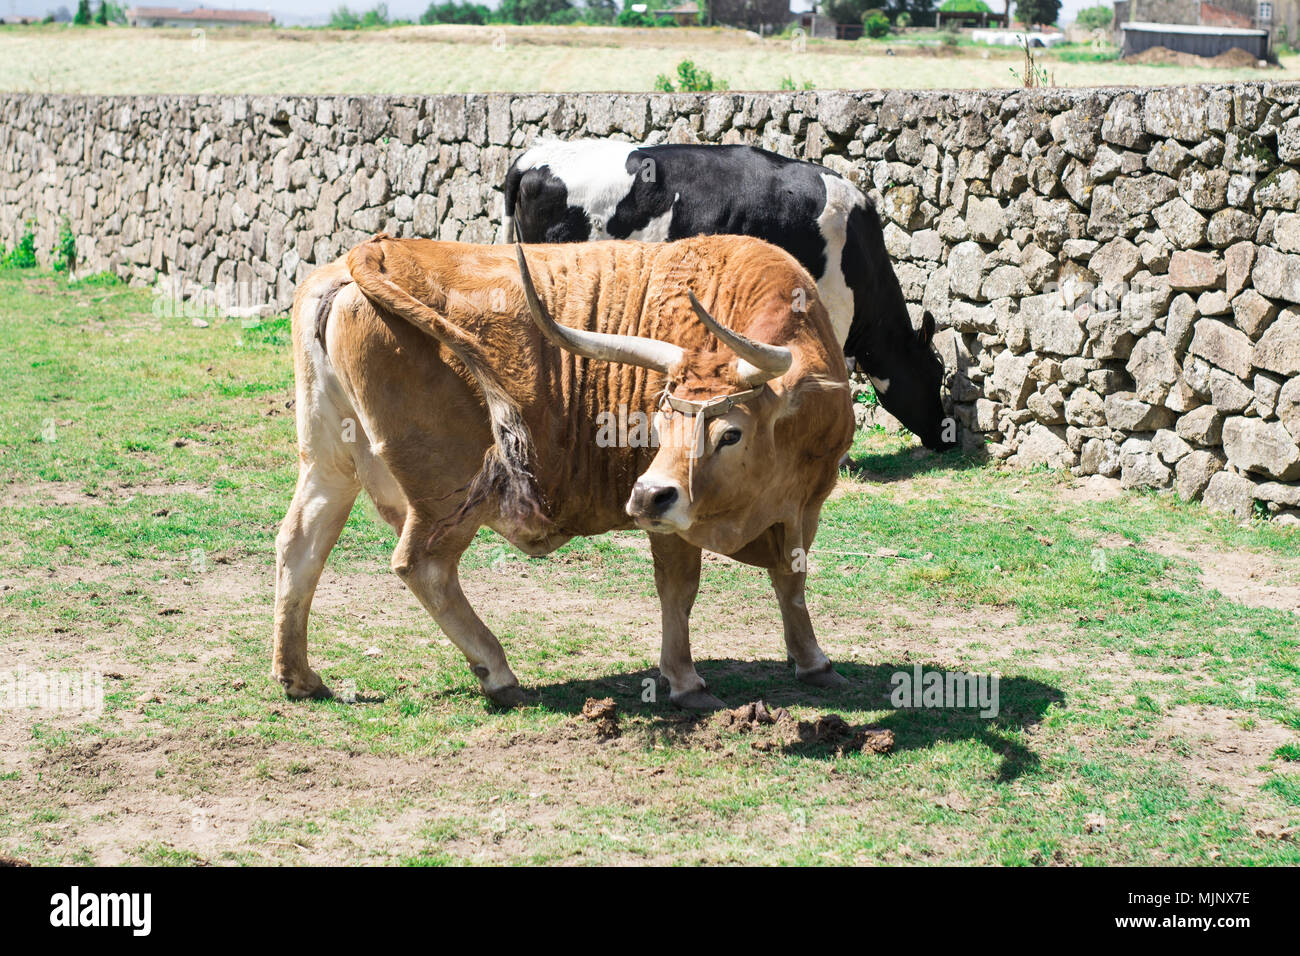 vaca mirandesa, portuguese species of cows in the farm - Stock Image